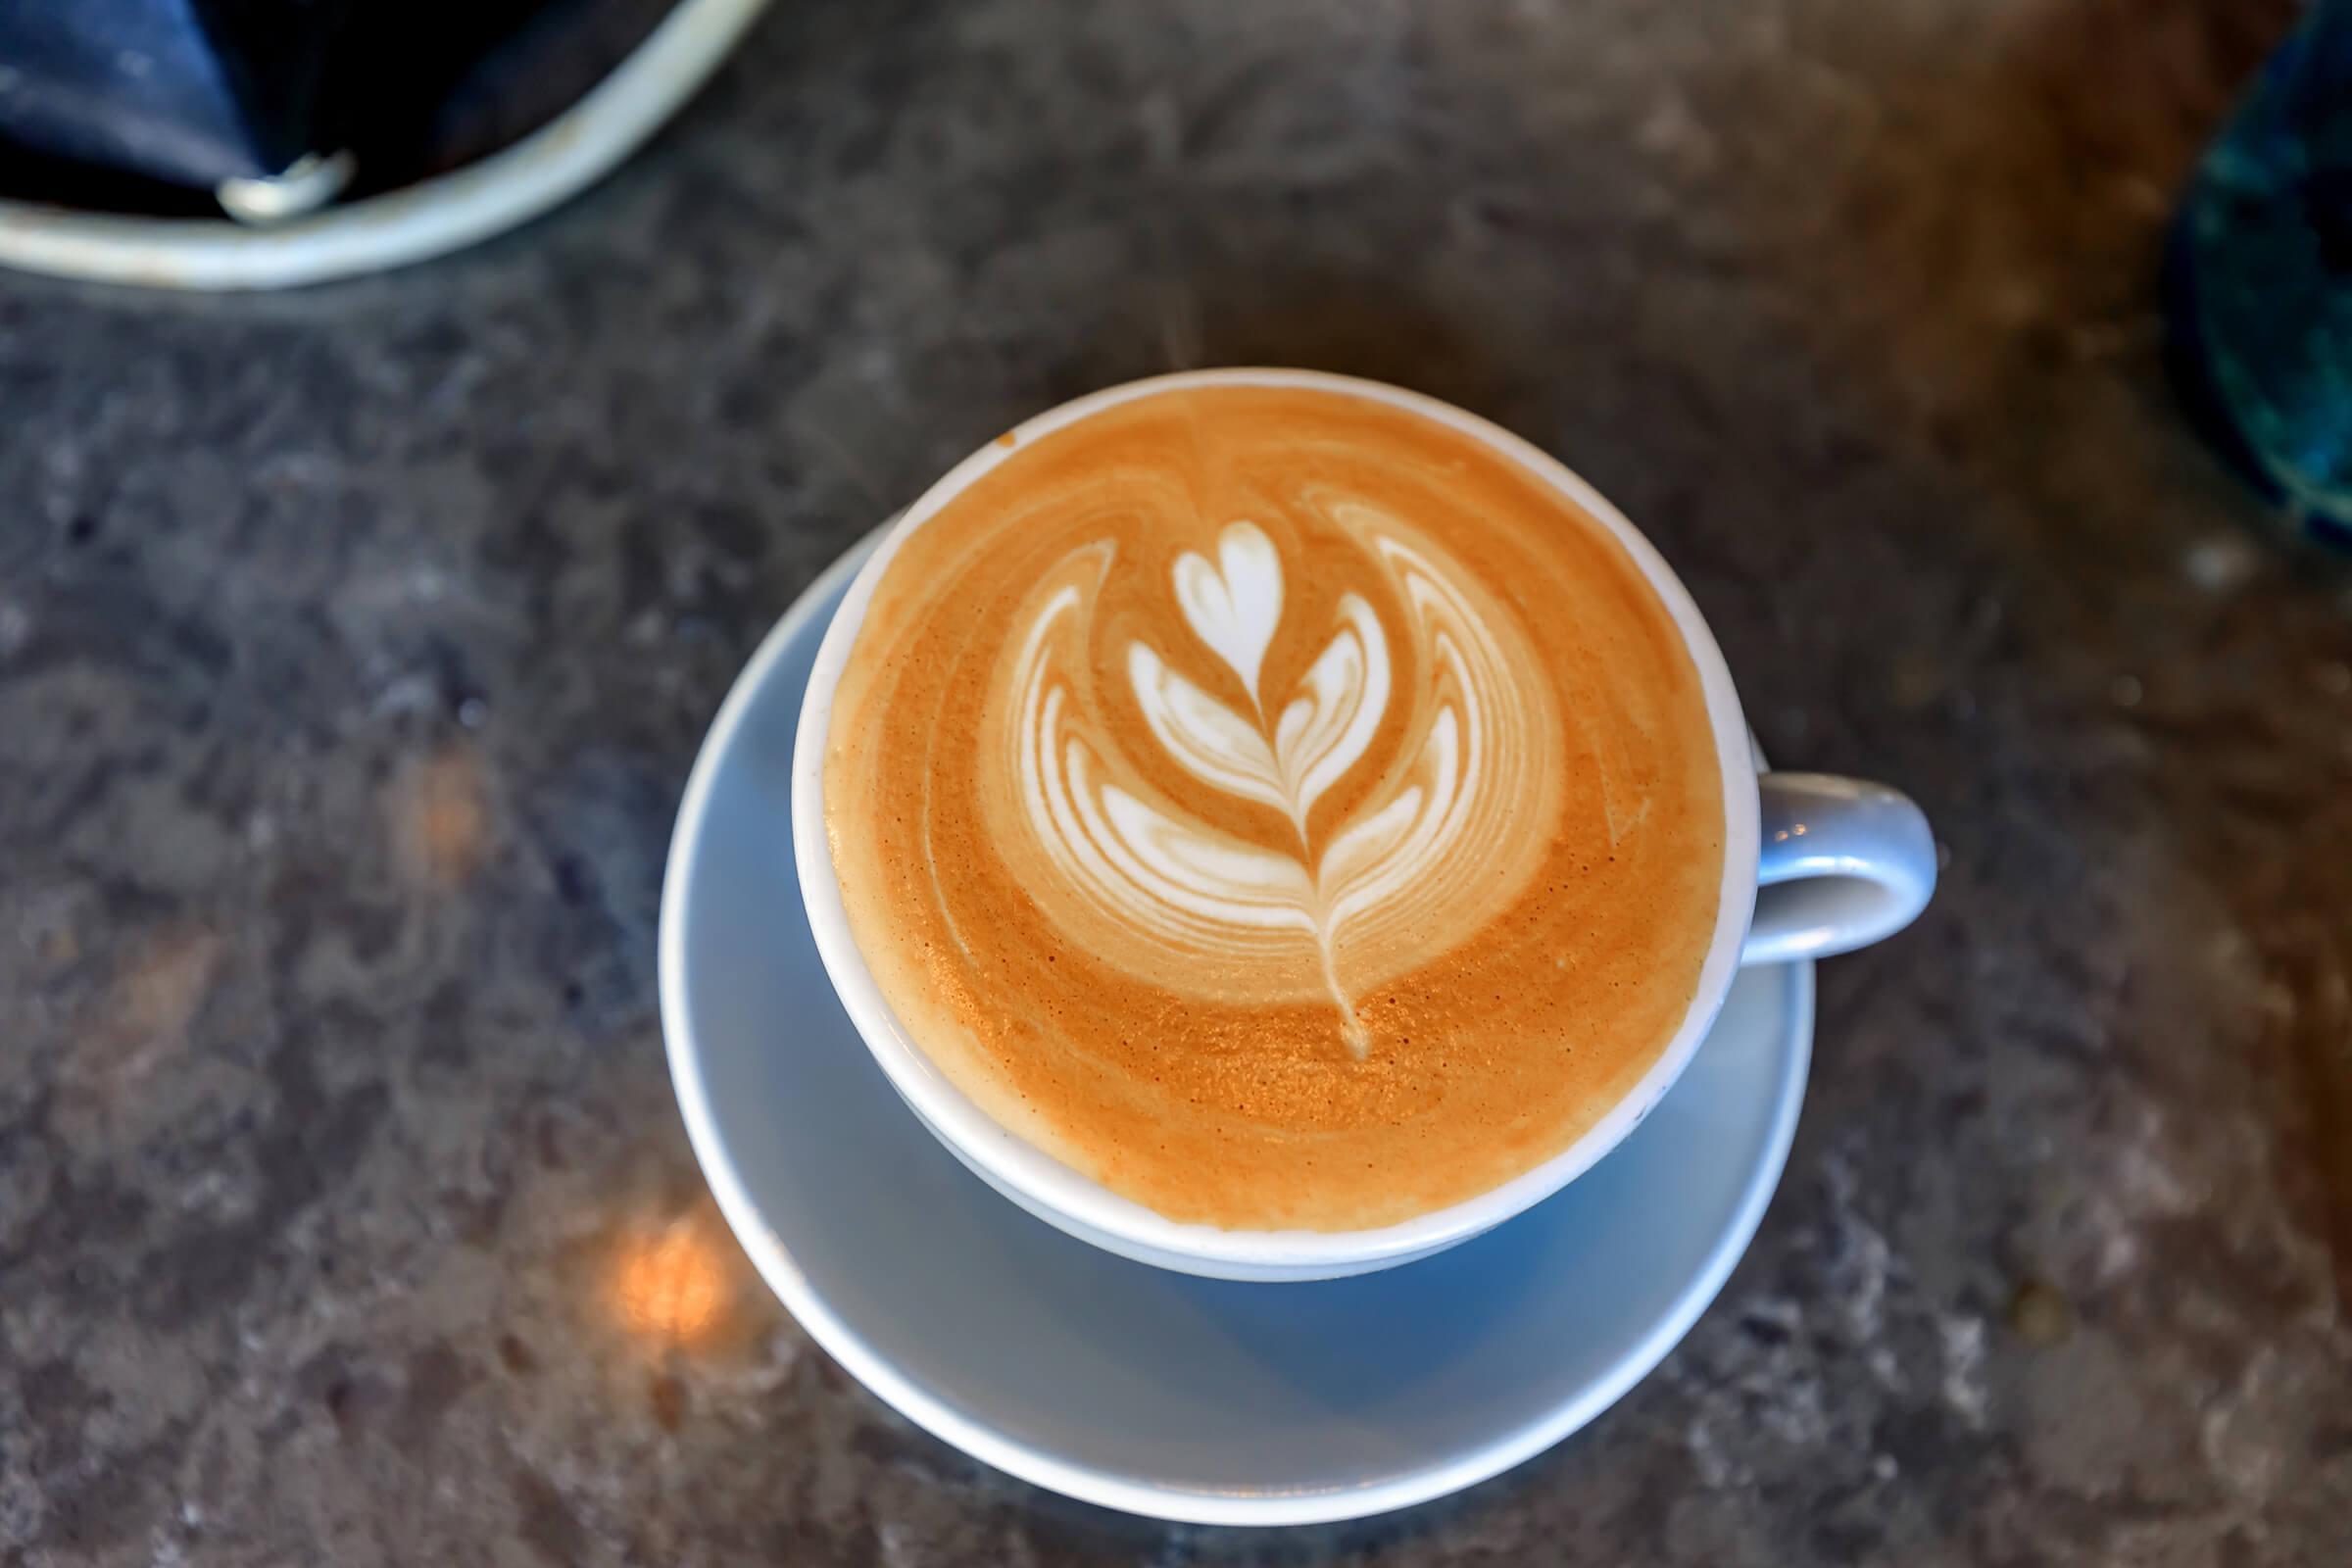 Coffee at C Street Flatsin Laurel MD